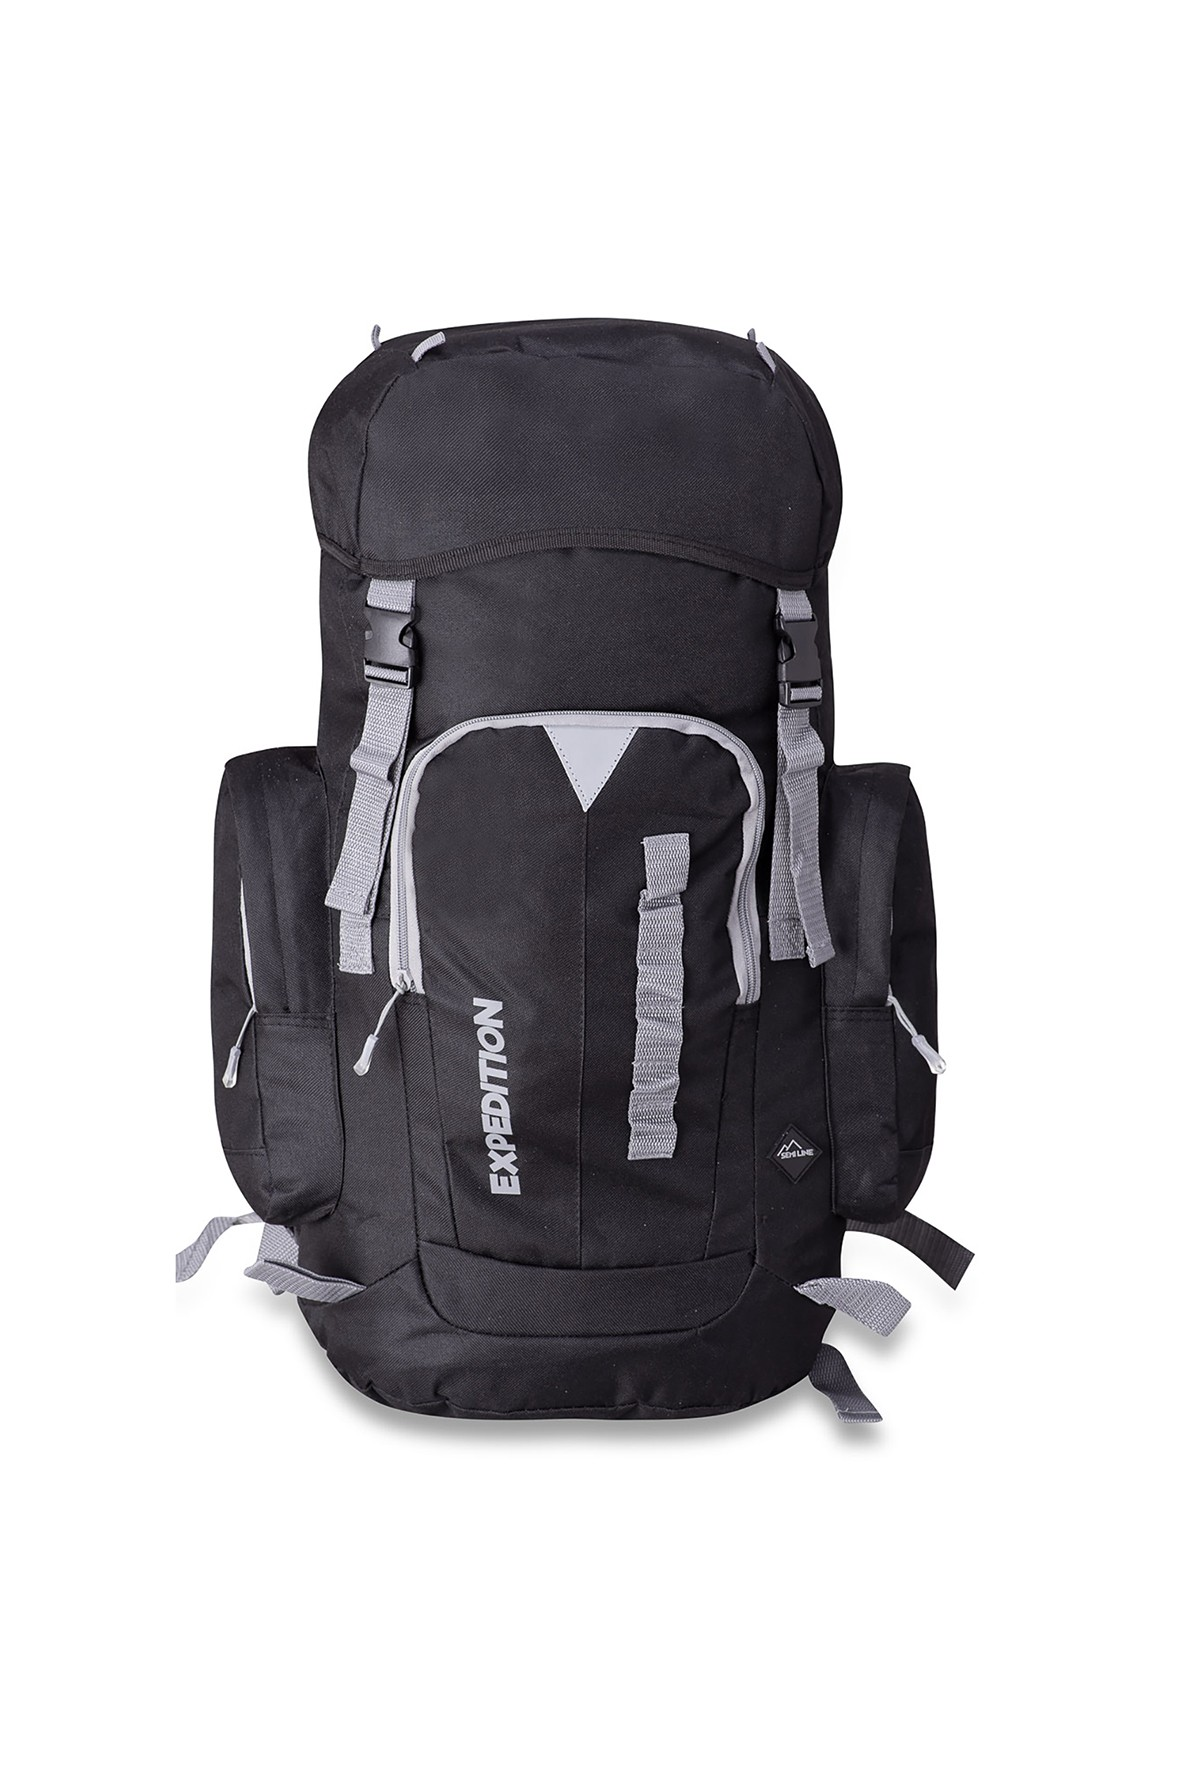 Plecak trekkingowy 35L czarny